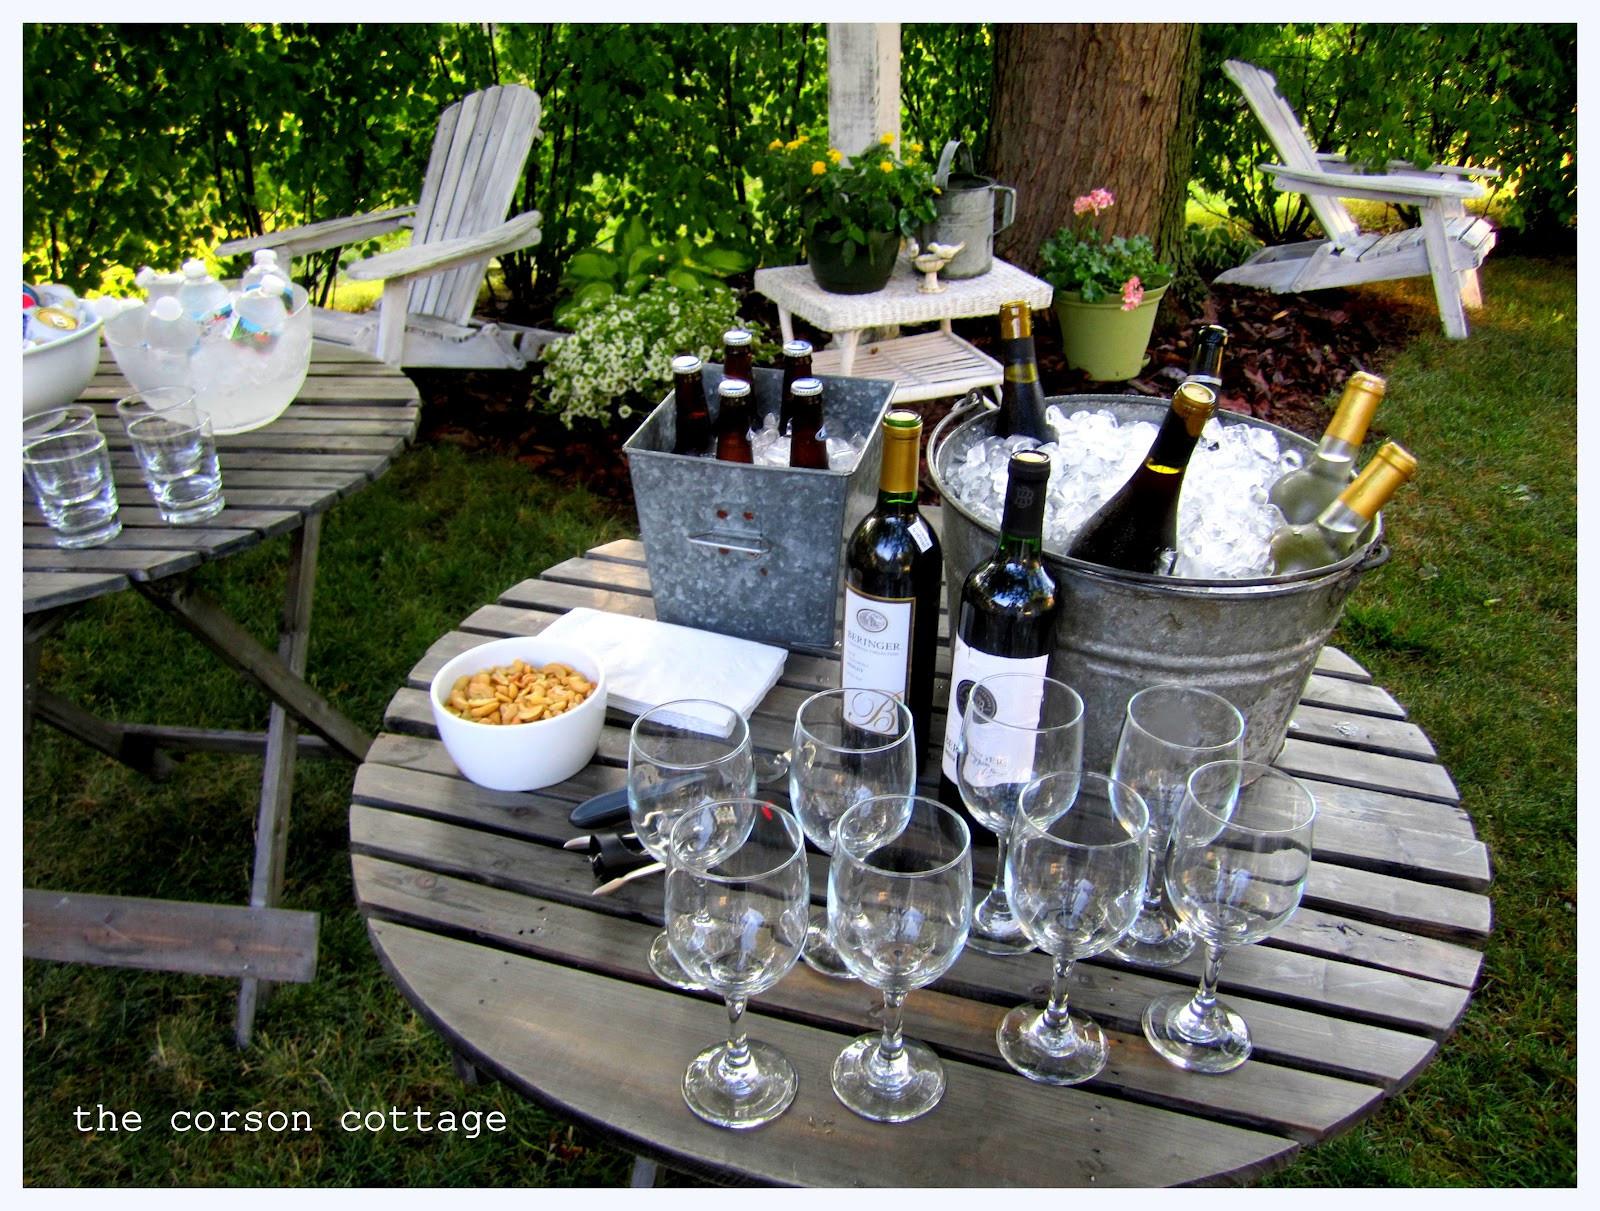 Backyard Party Set Up Ideas  the corson cottage Outdoor Entertaining Backyard Party